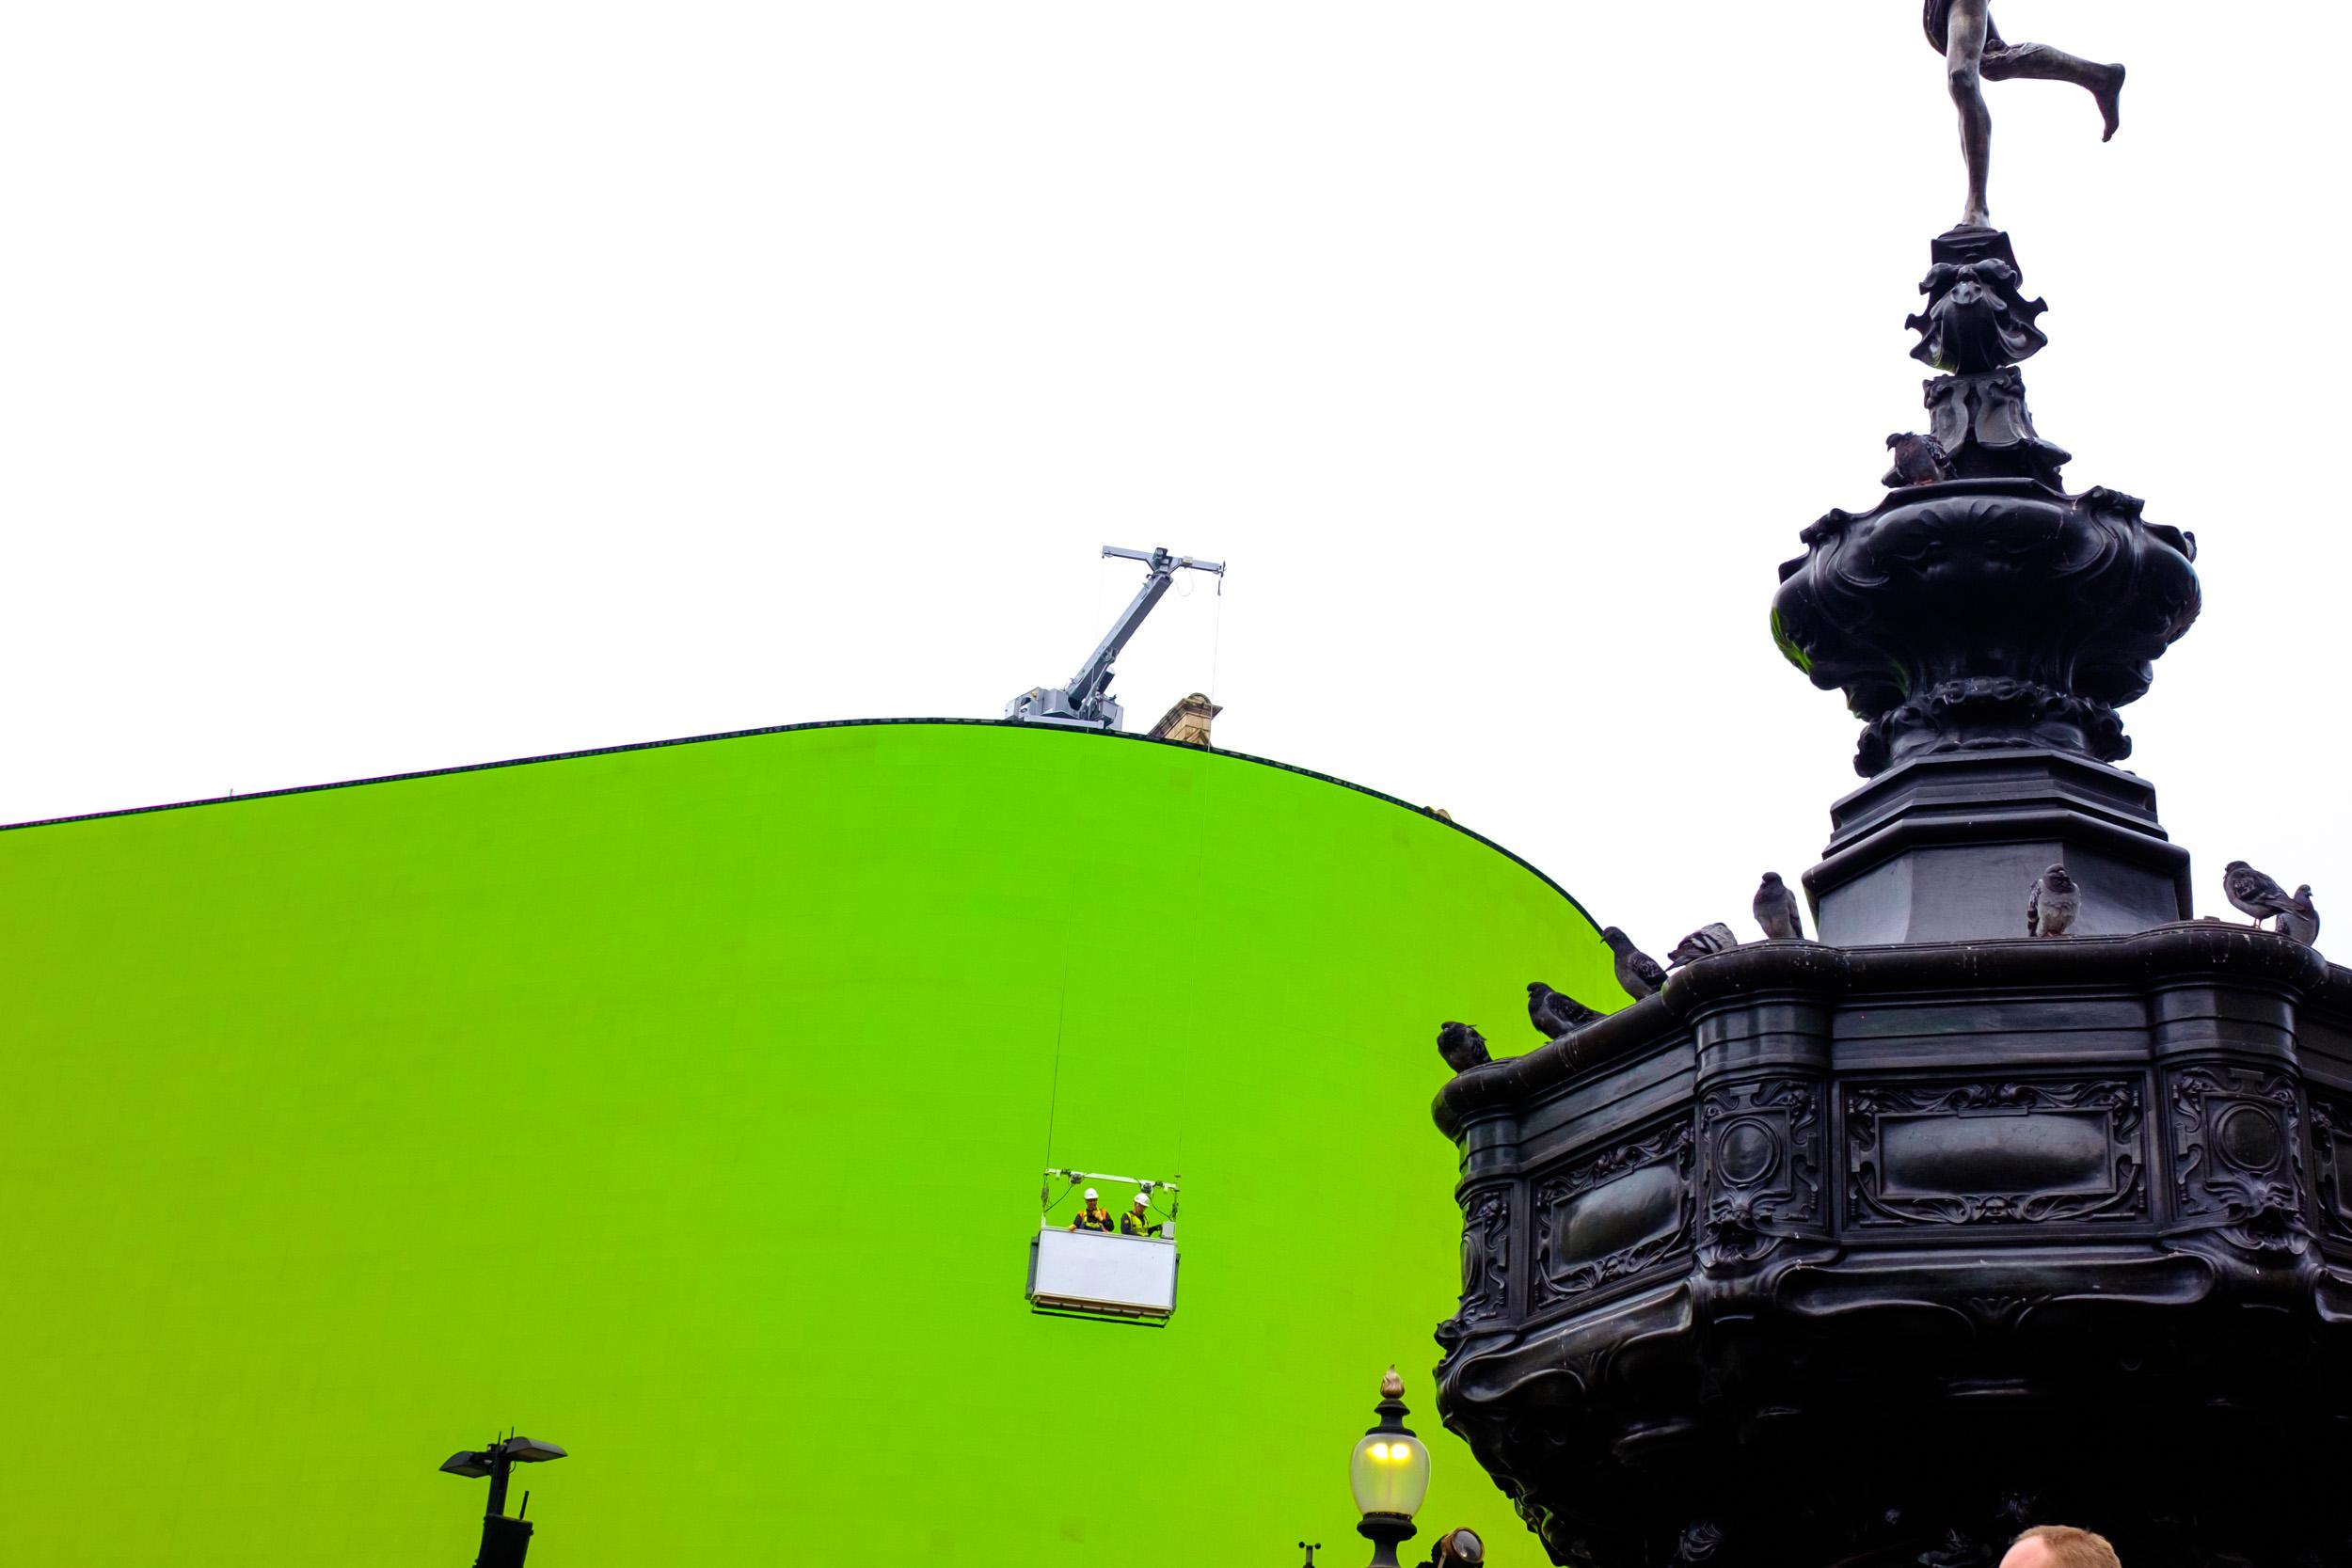 Green Screen. London, England 2017